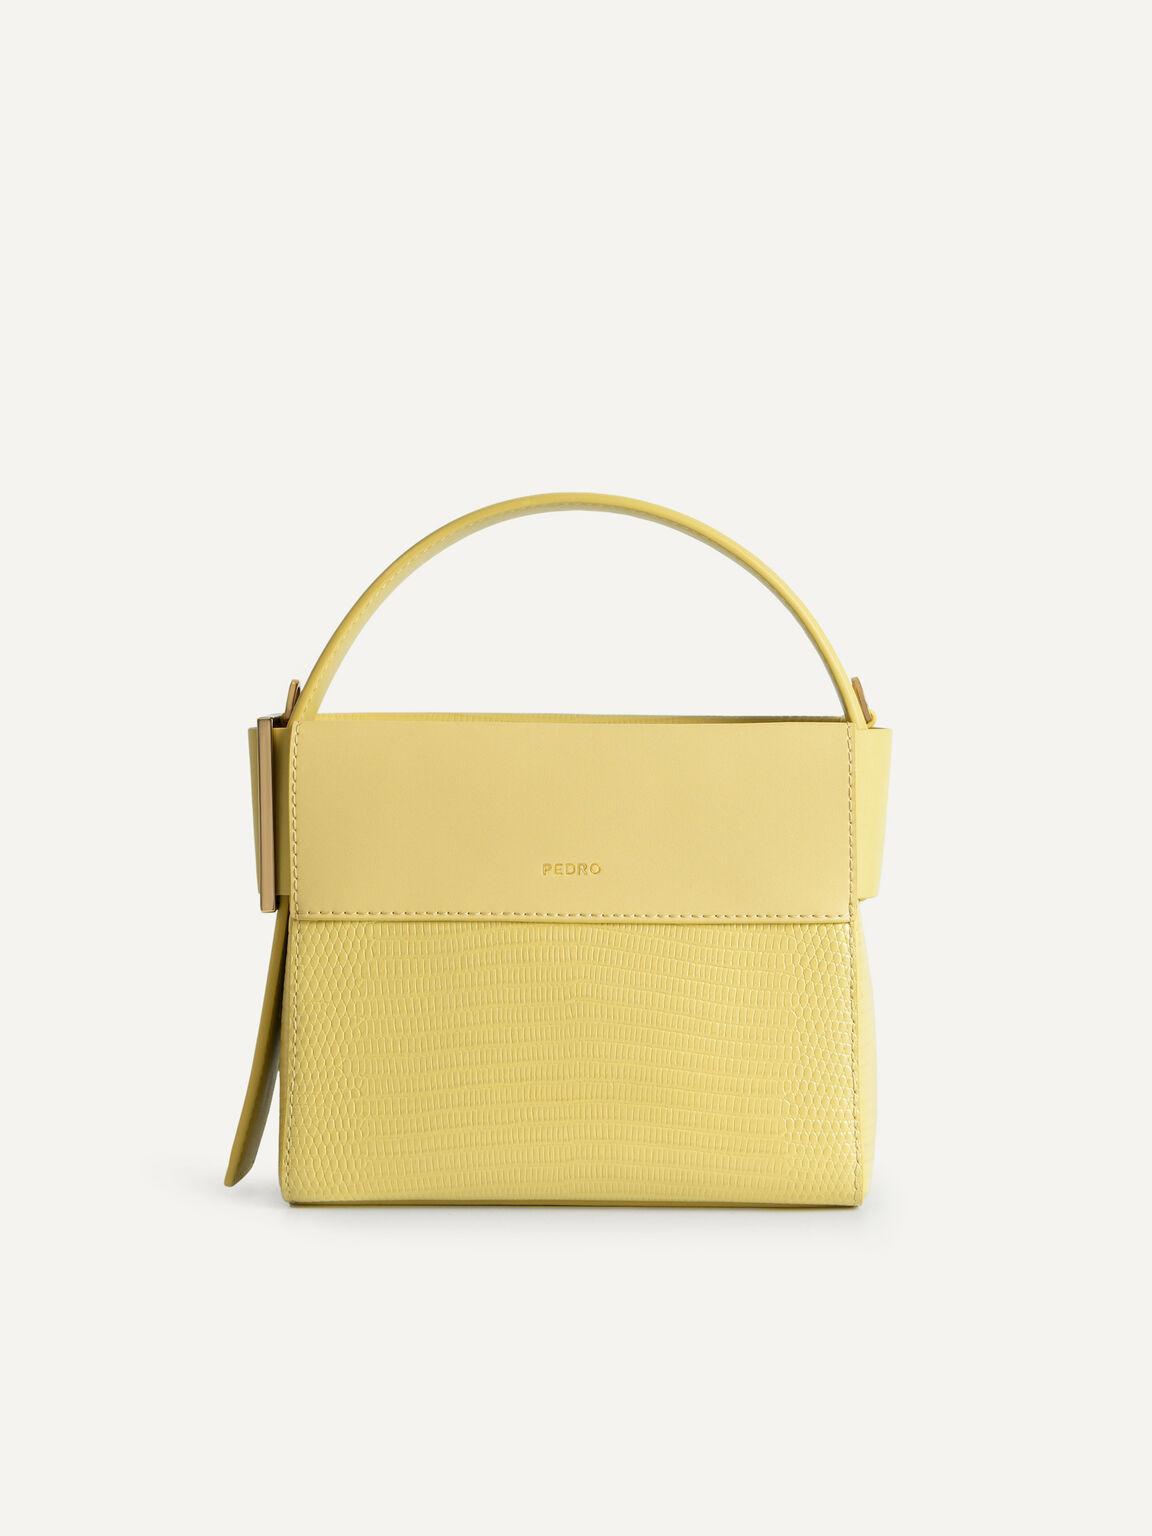 Lizard-Effect Leather Mini Bag, Sand, hi-res